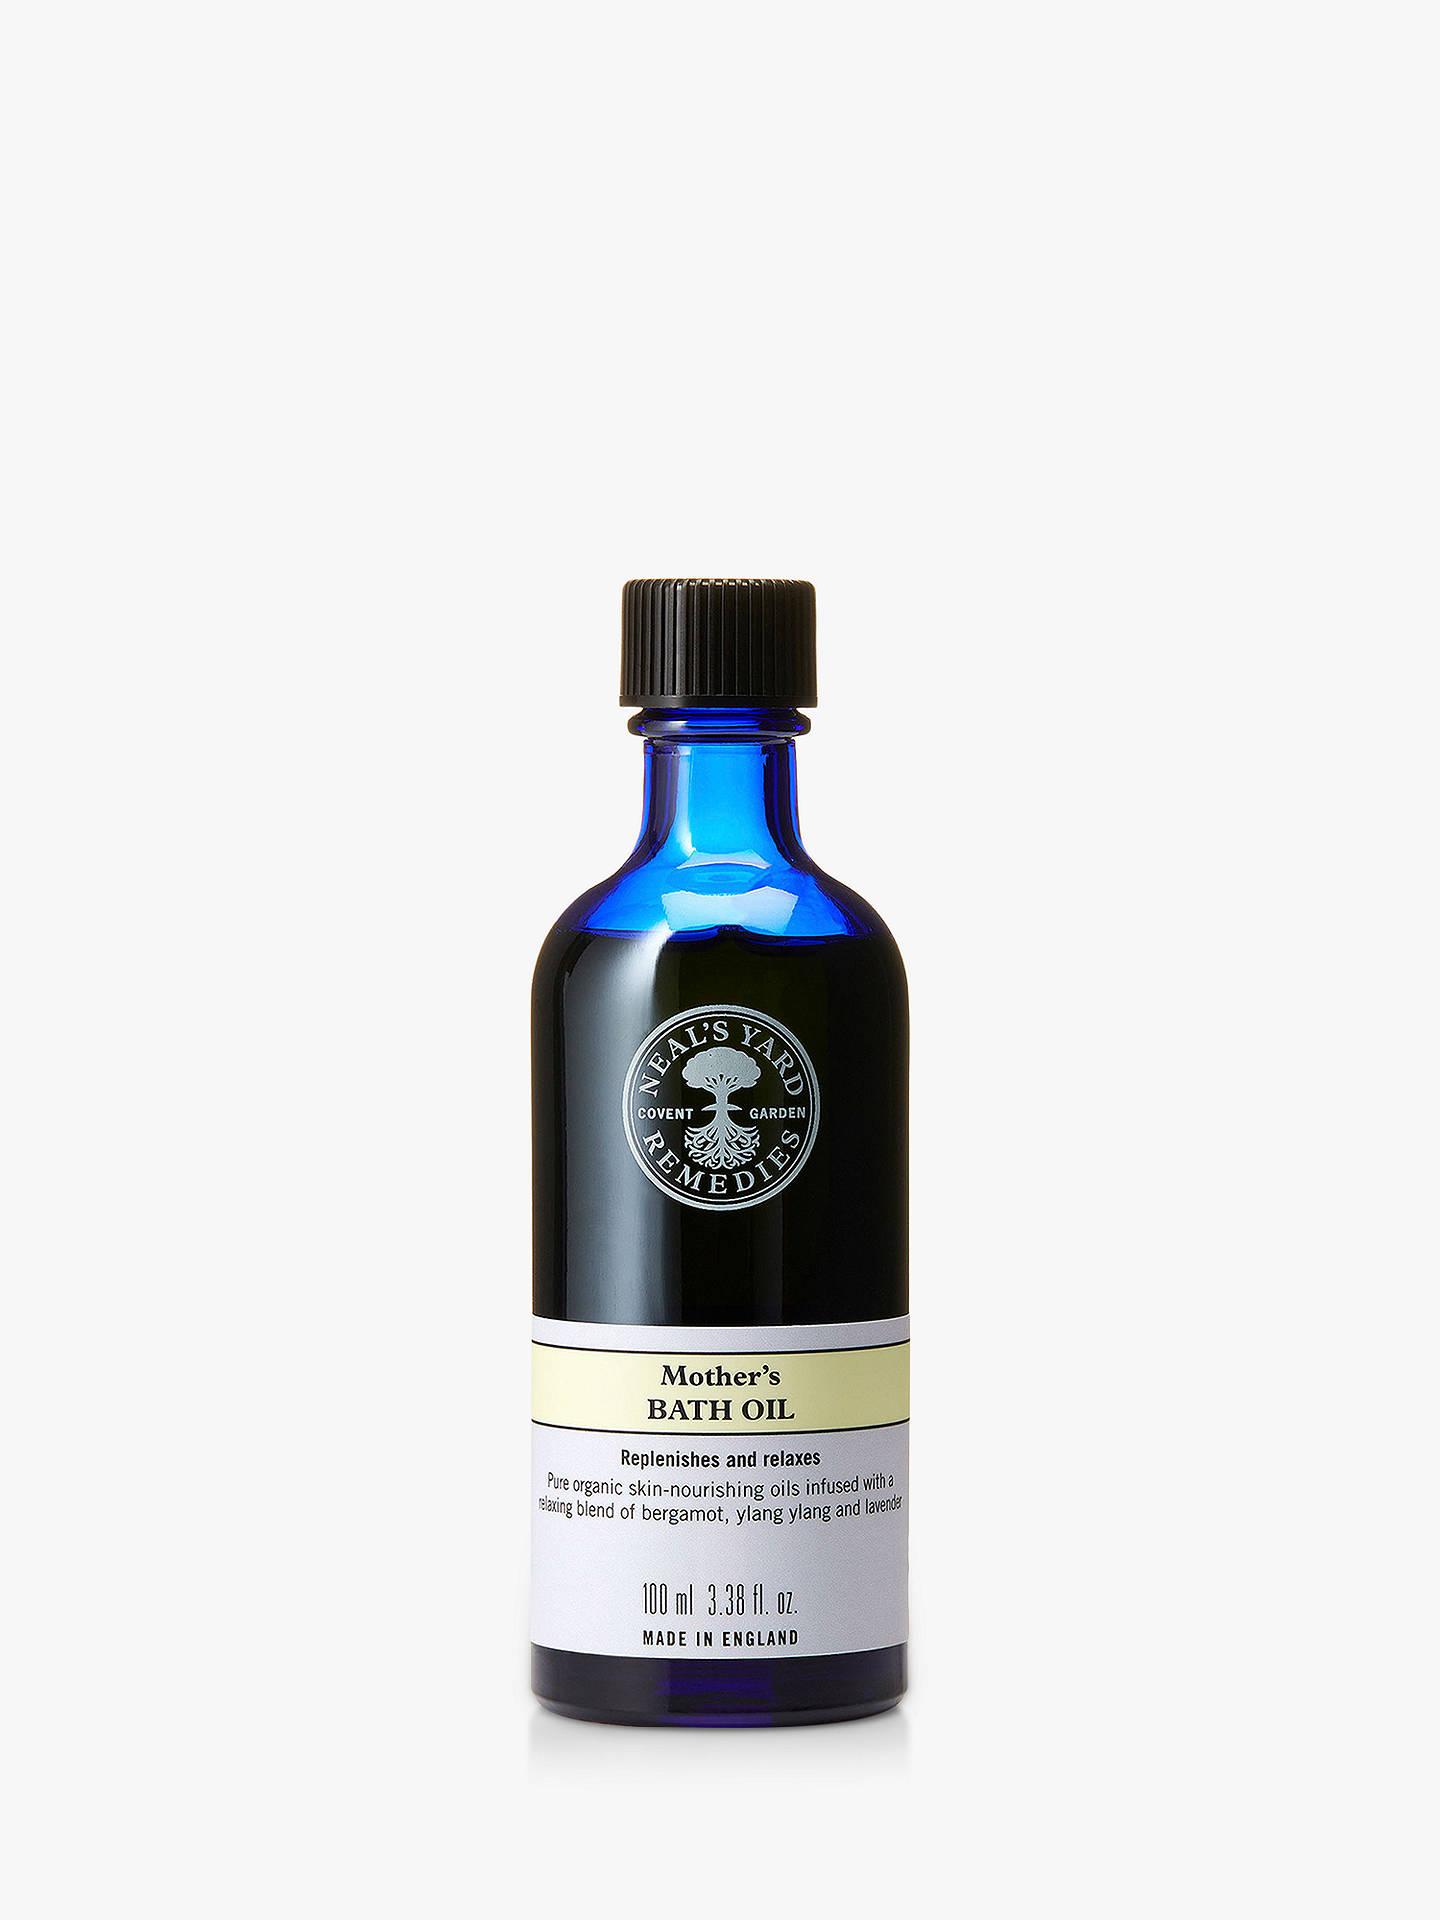 Neal's Yard Remedies Organics Mother's Bath Oil